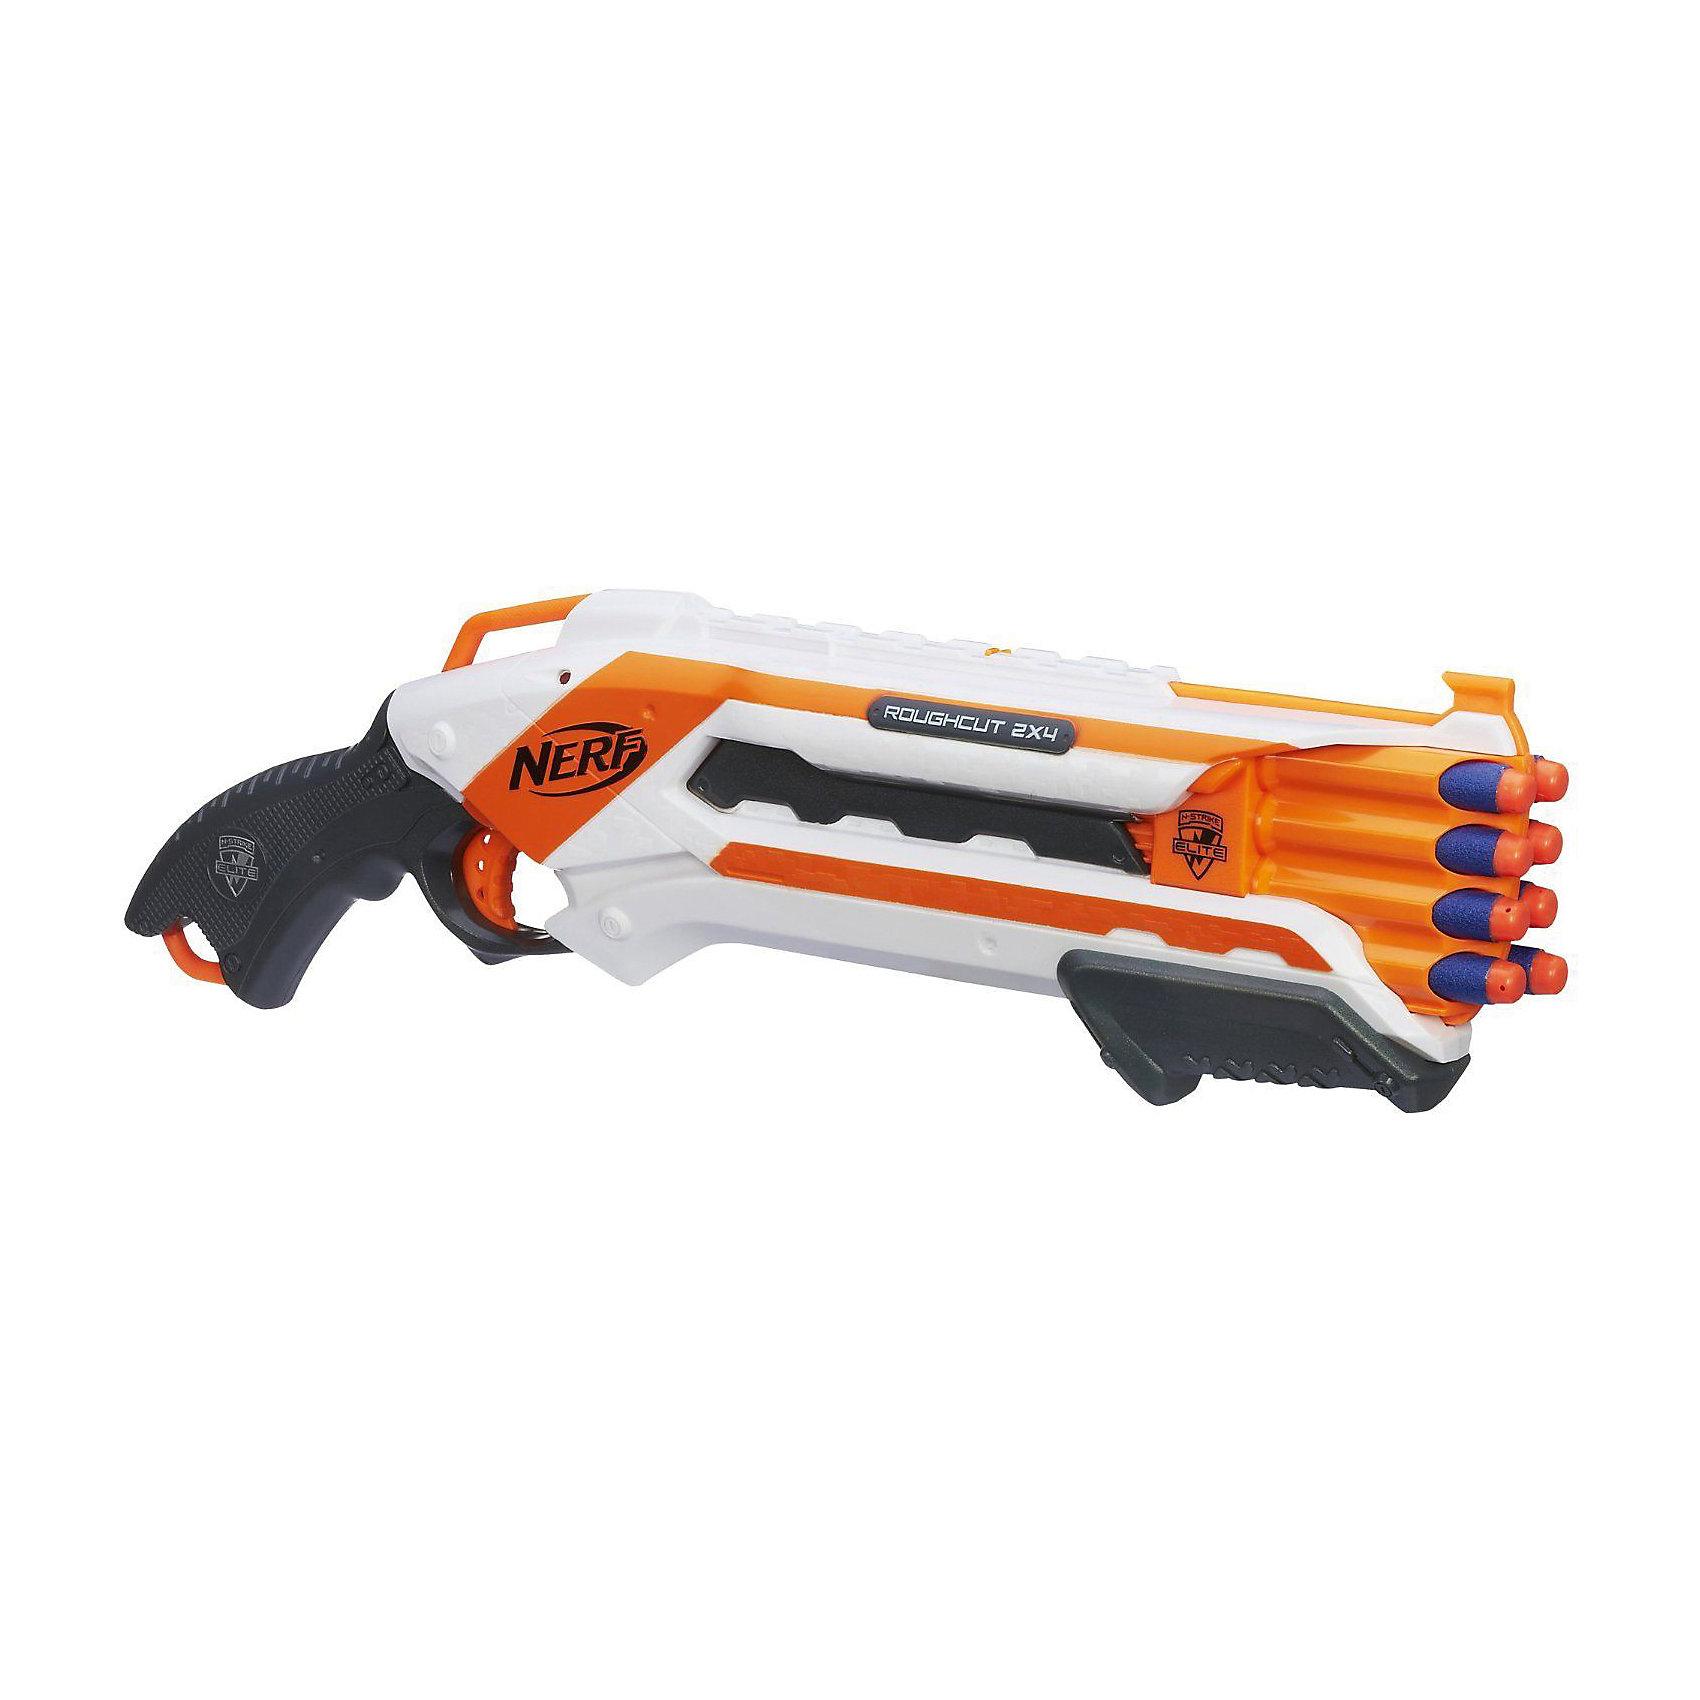 Hasbro Бластер  Элит Рафкат, NERF игрушечное оружие nerf hasbro бластер элит разрушитель